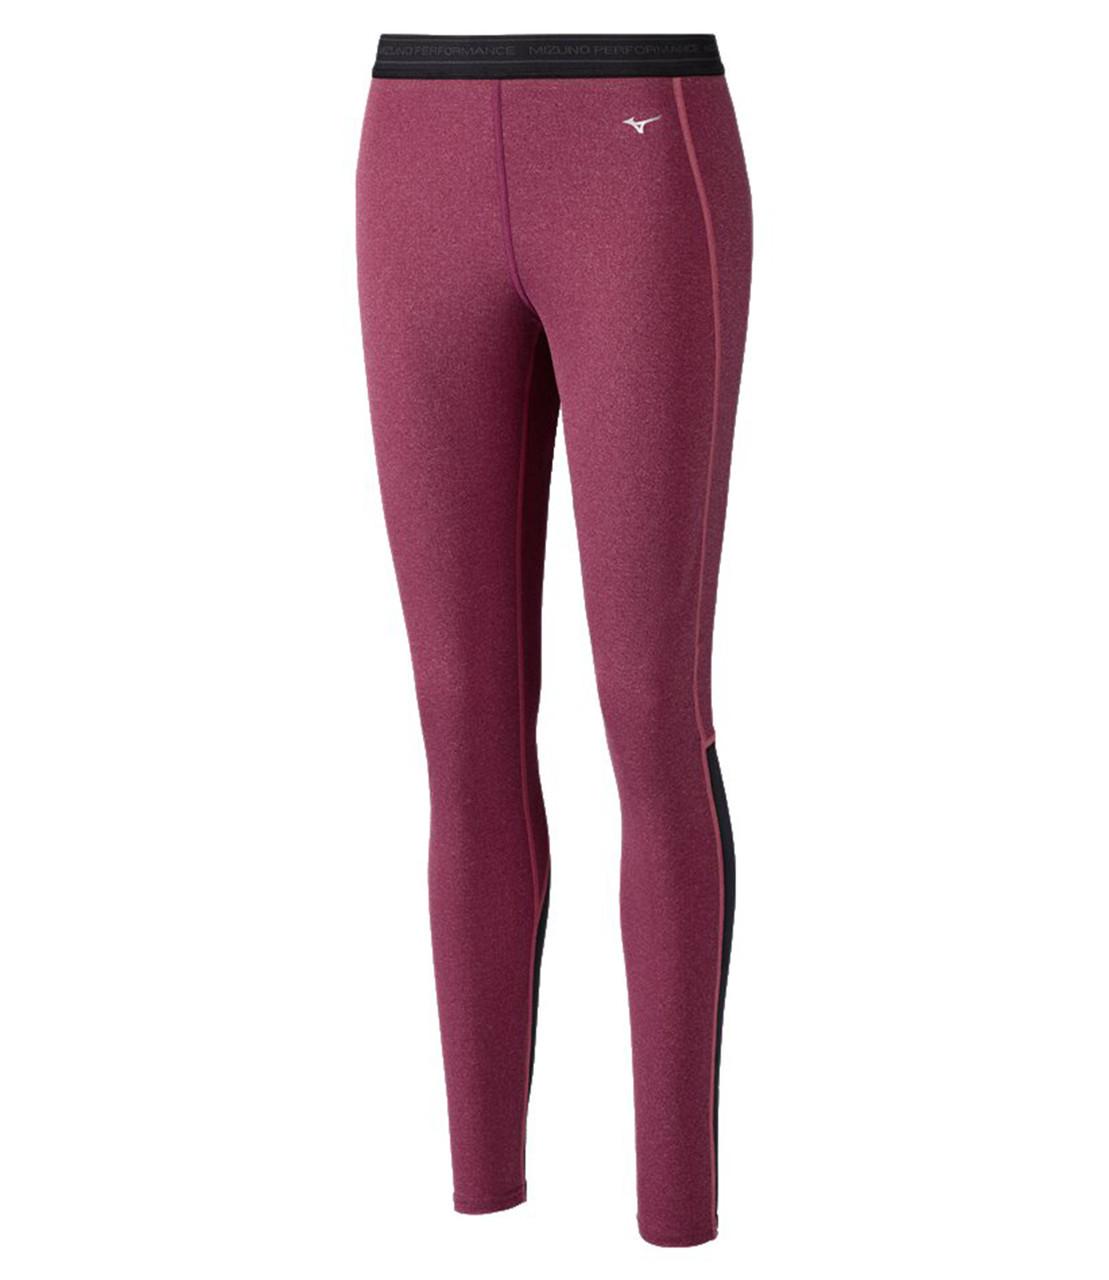 Термолосины Mizuno Merino Wool Long Tights (Women) 73CL376-59